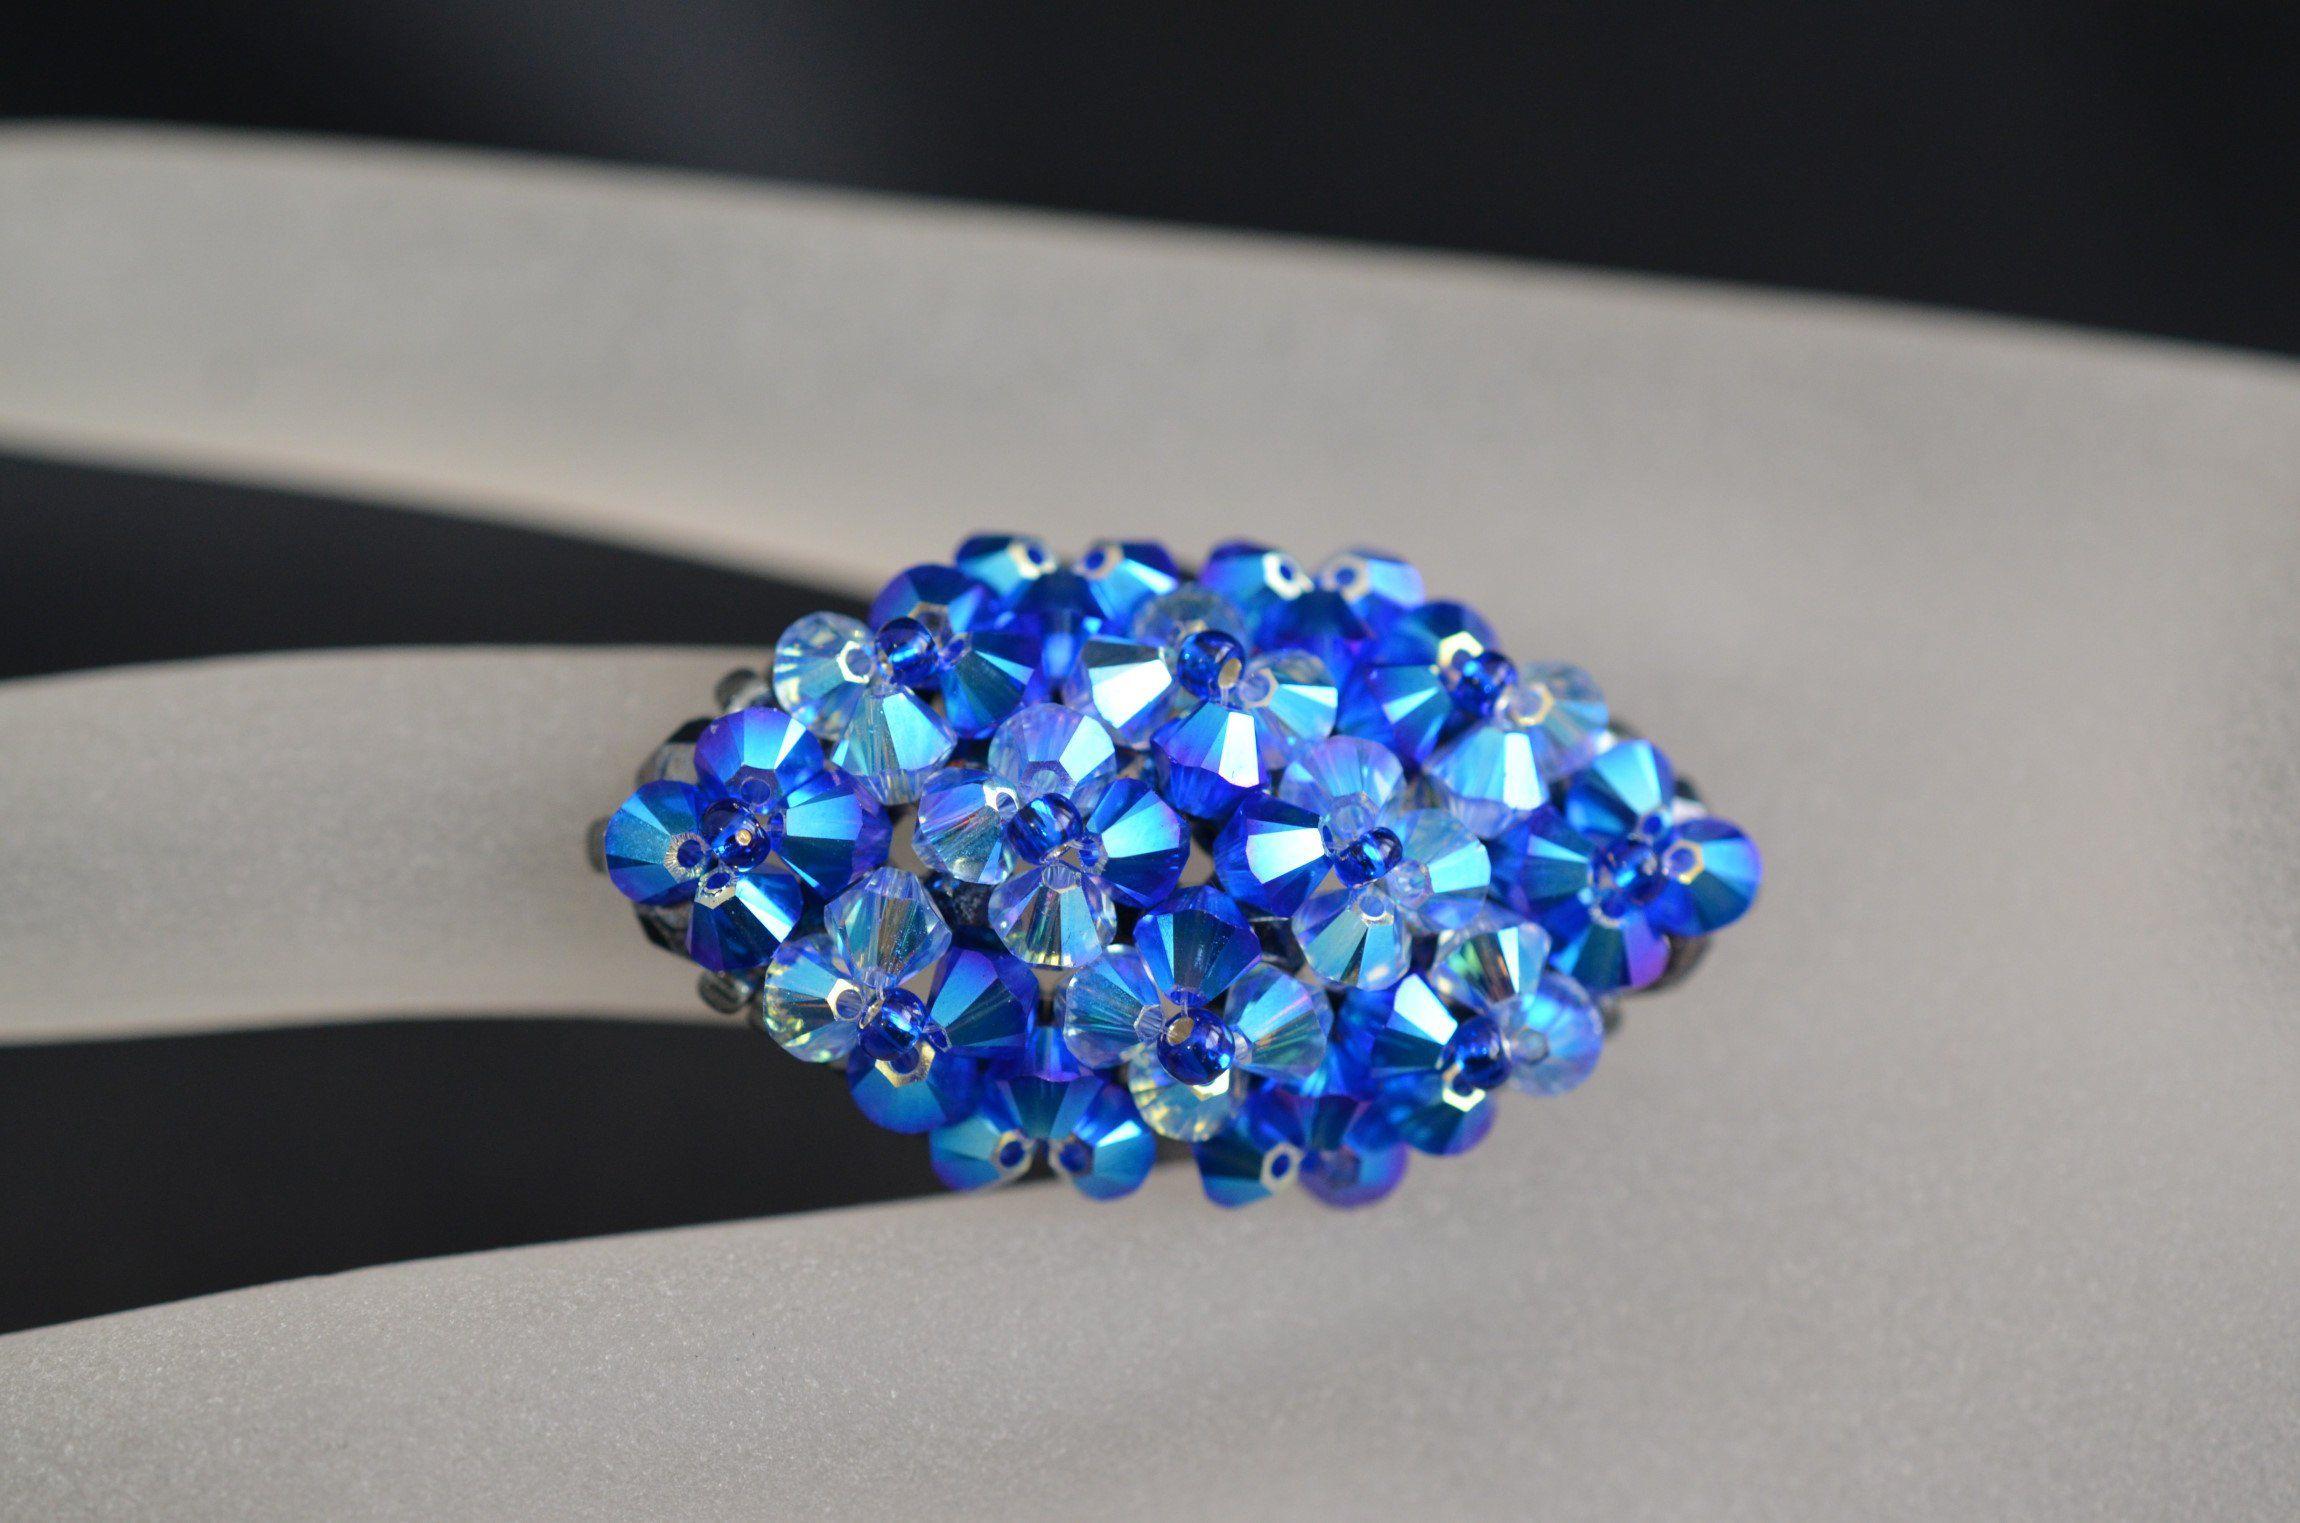 Crystal Swarovski, Swarovski crystal ring, fashion, blue, marquise ...